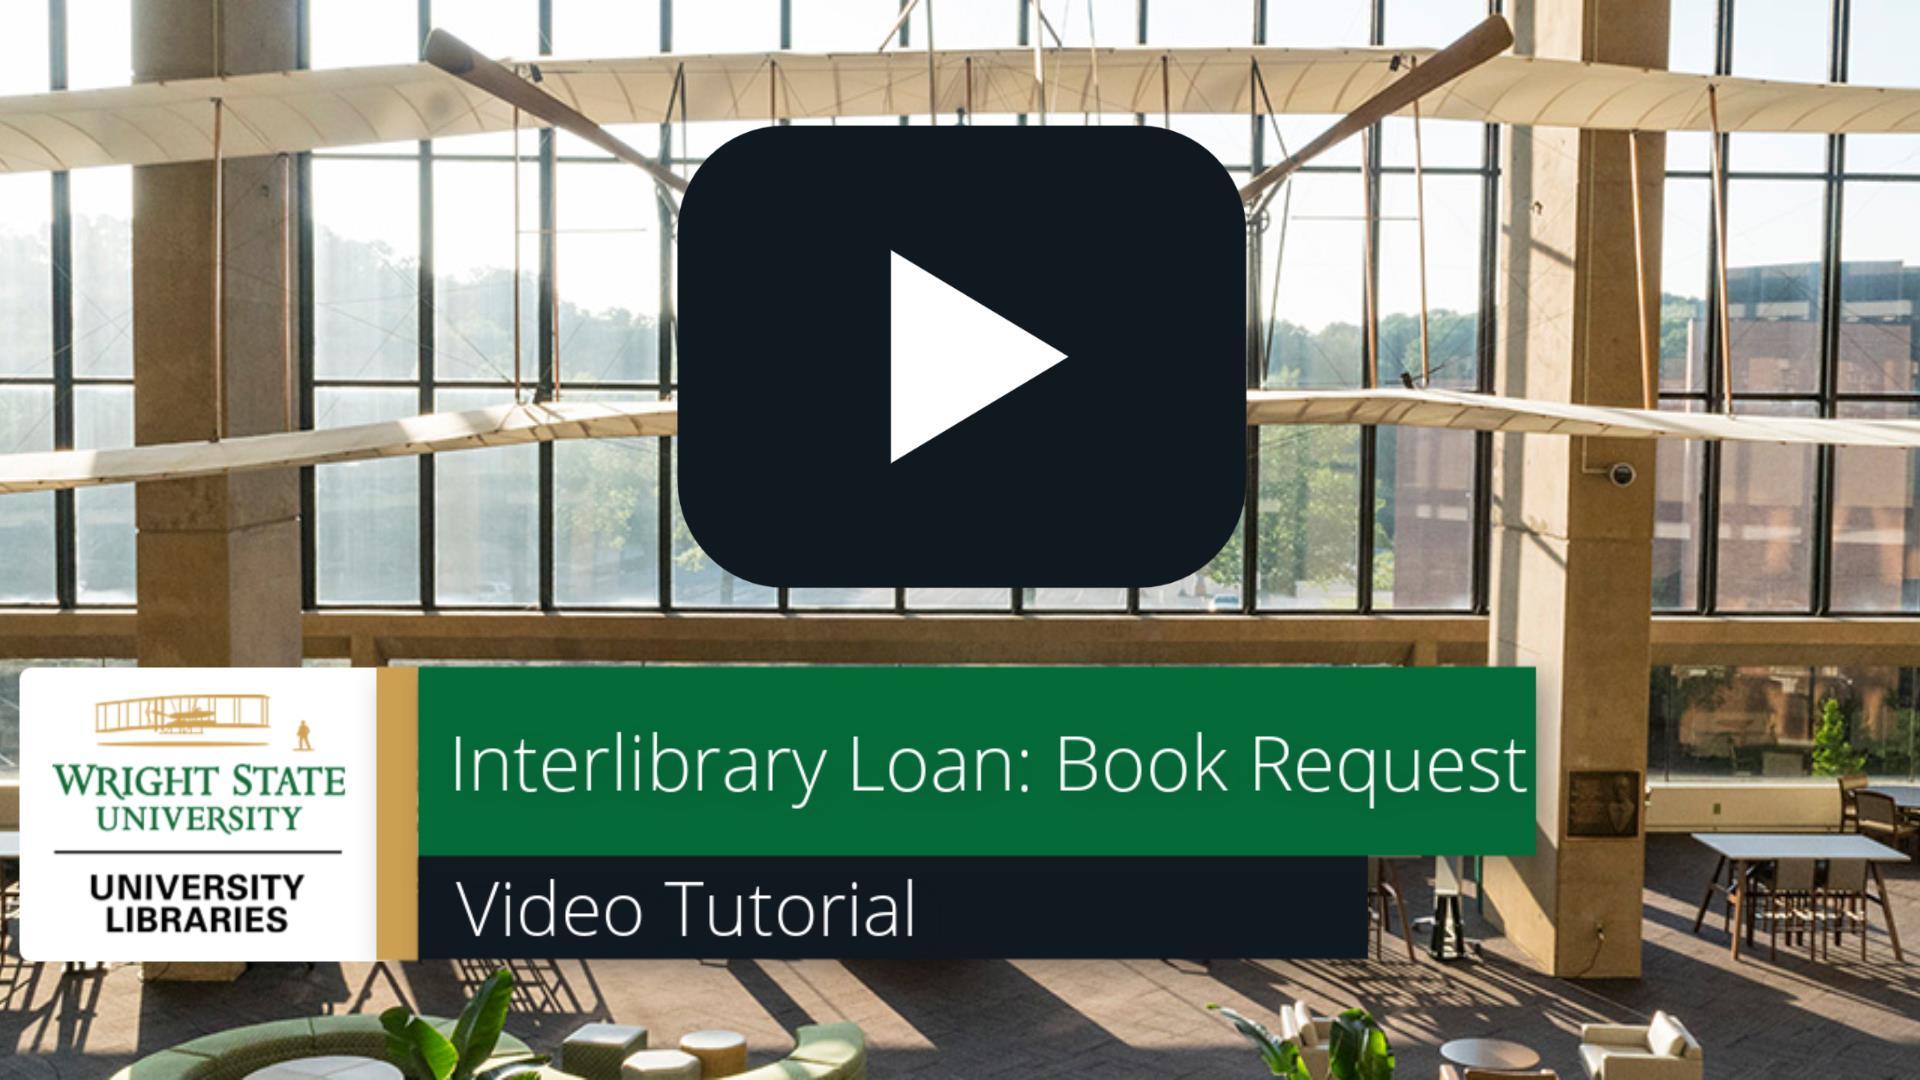 Interlibrary Loan Book Request: Video Tutorial